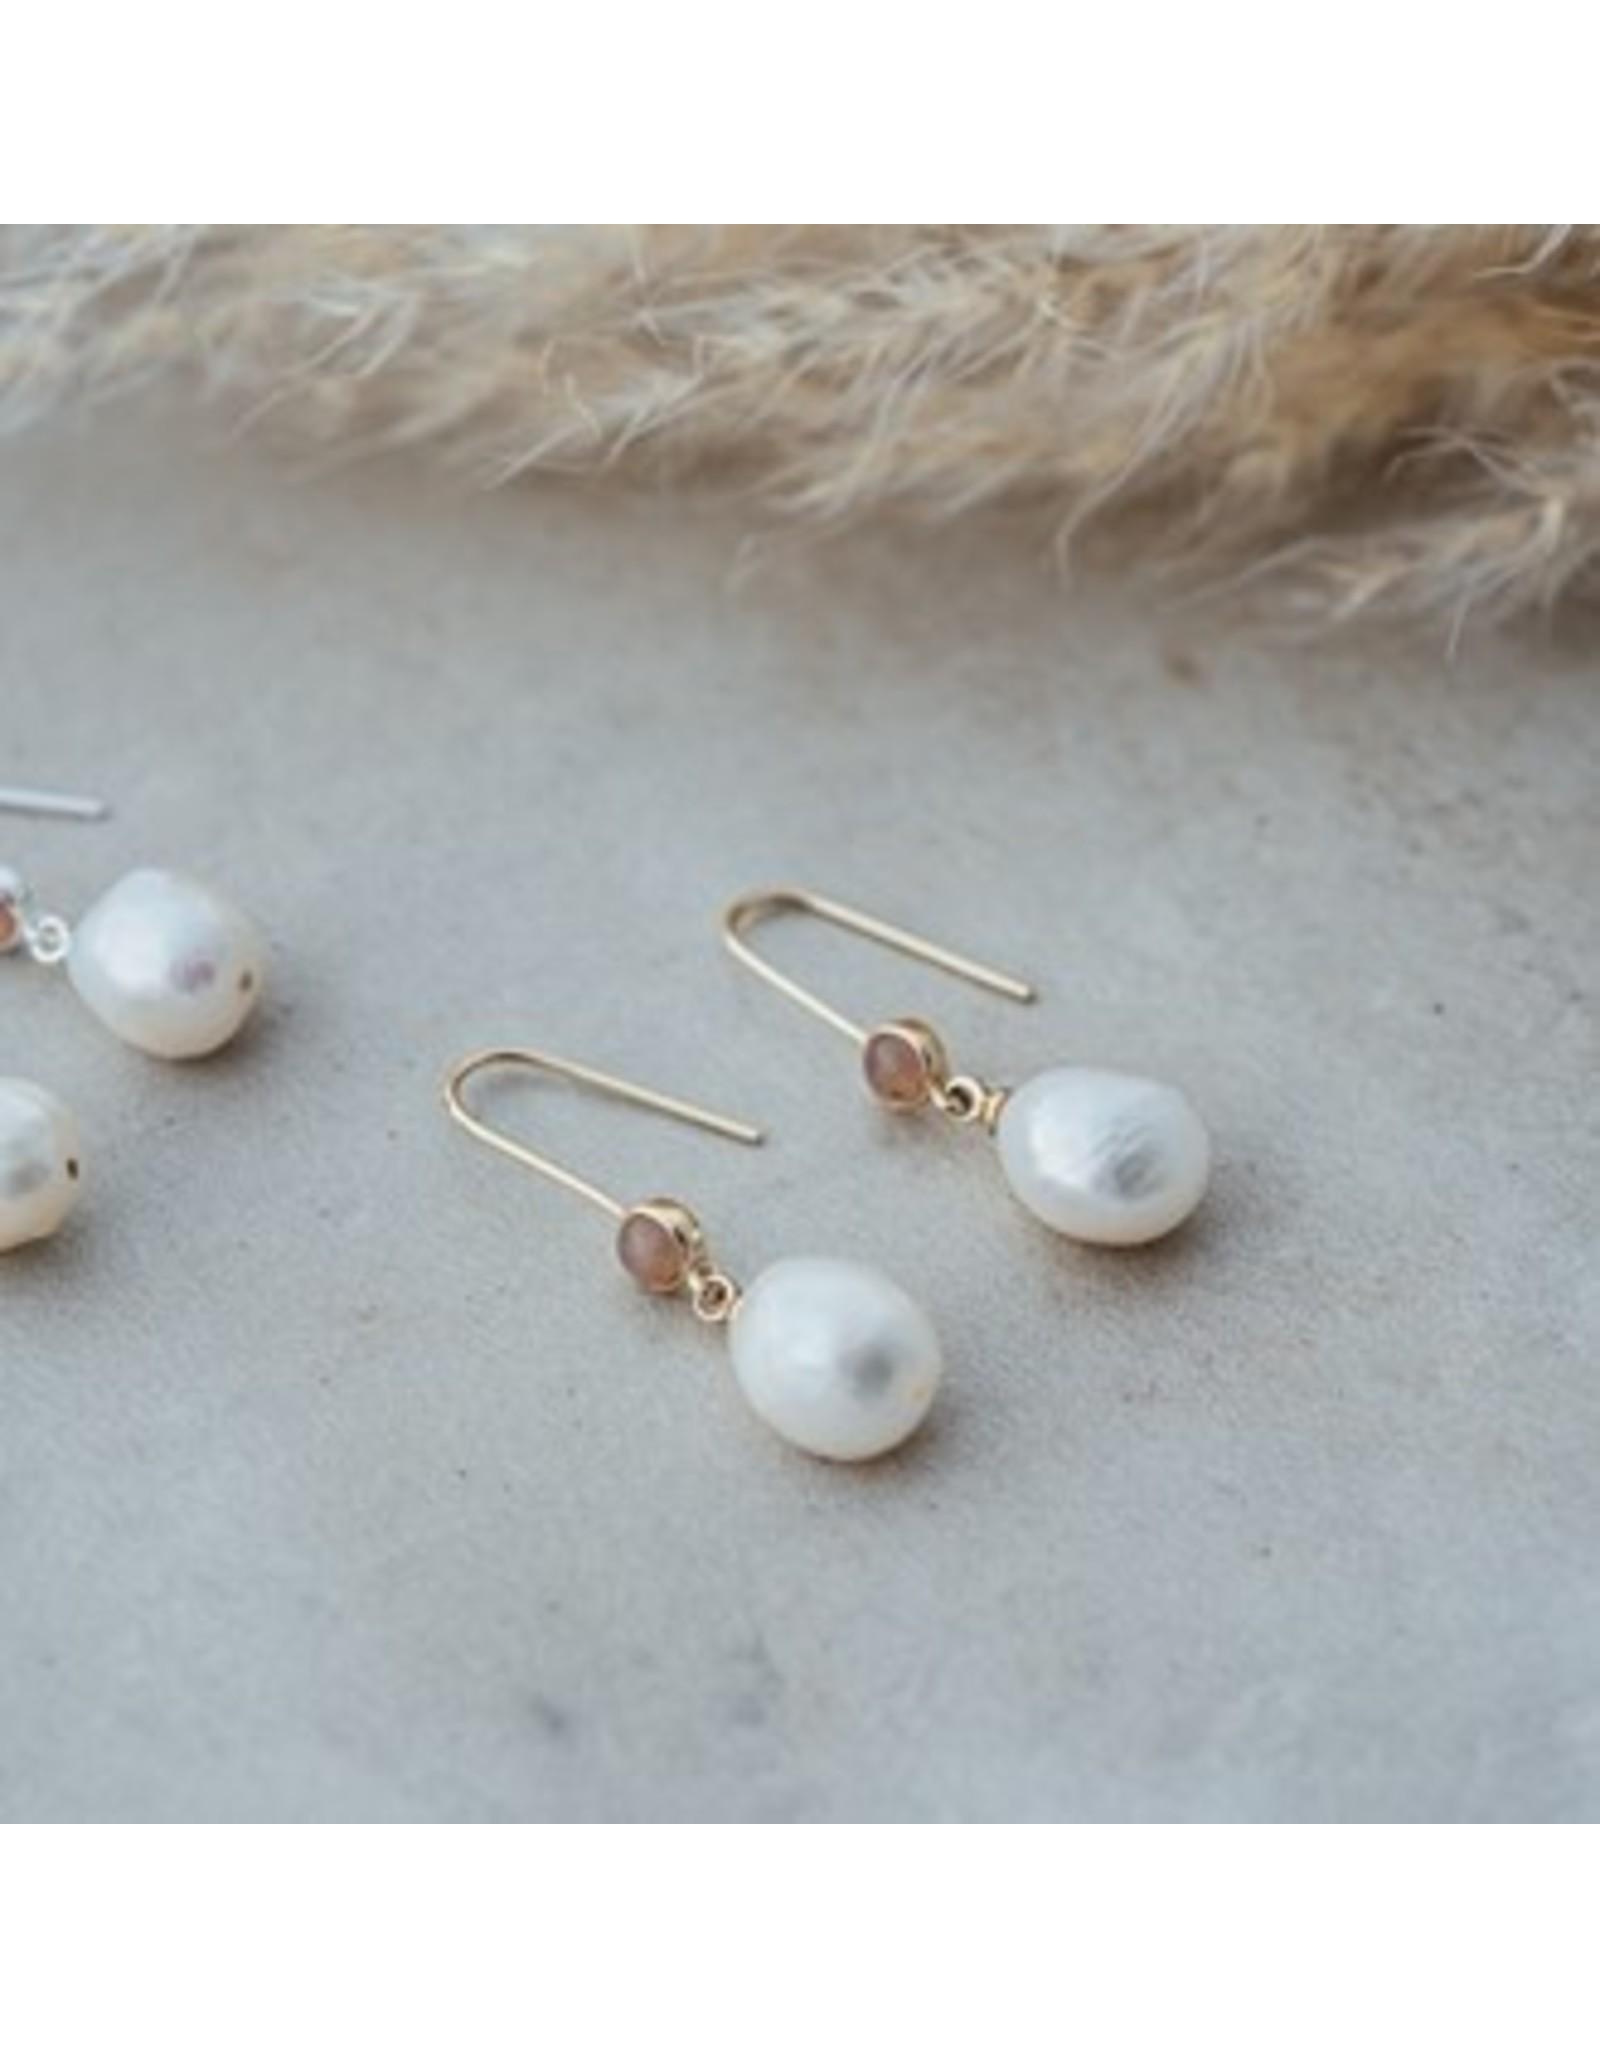 Glee jewelry Beatrice Earrings/Gold/Grey Moon Stone&White Pearl